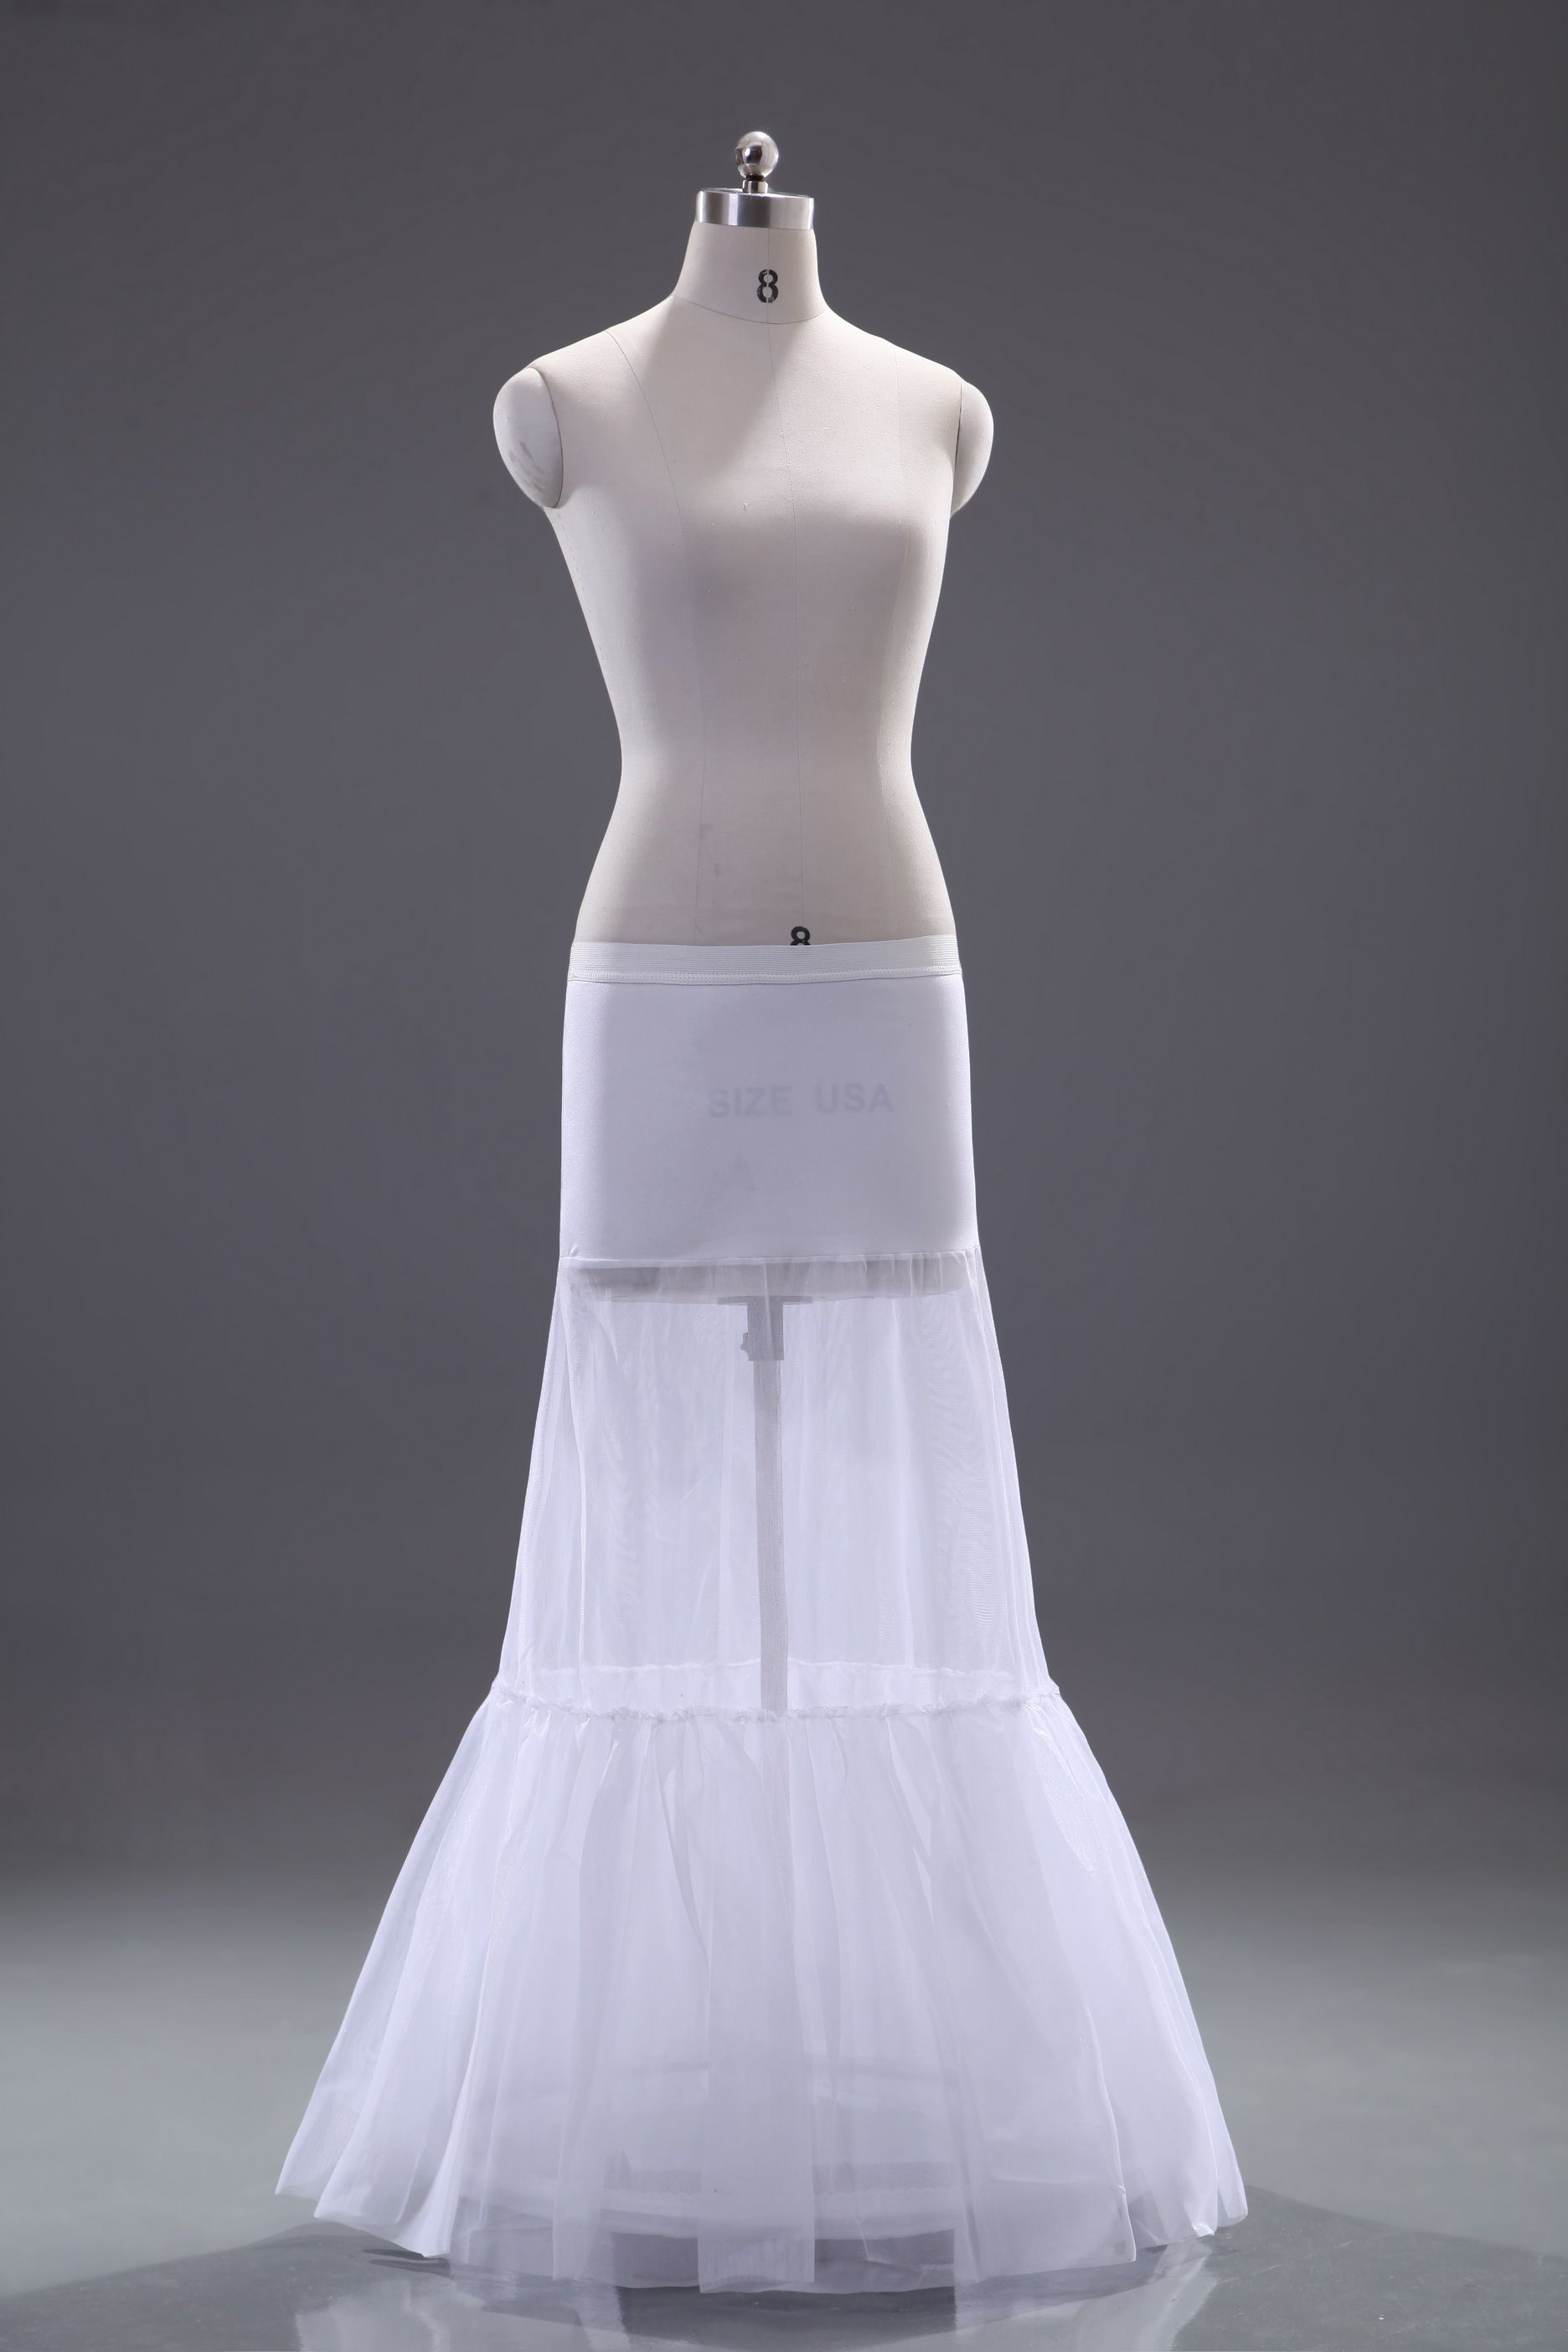 Apparel, Beautiful Mermaid Style Organza Single Wire Wedding Petticoat, Accessories,28.99